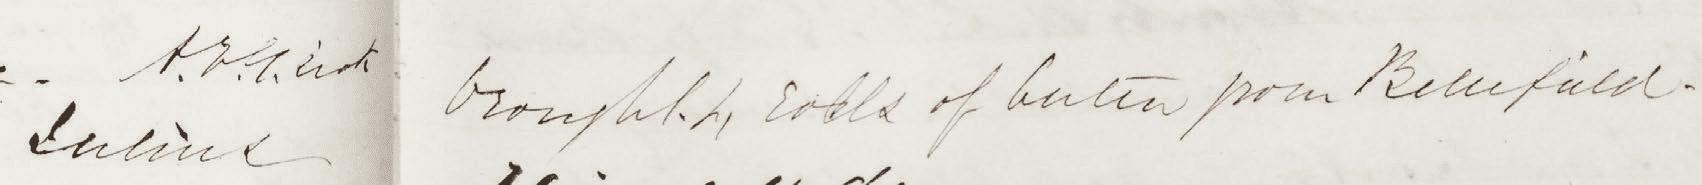 Julius brought 4 rolls of butter from Bellefield. 6 April 1861